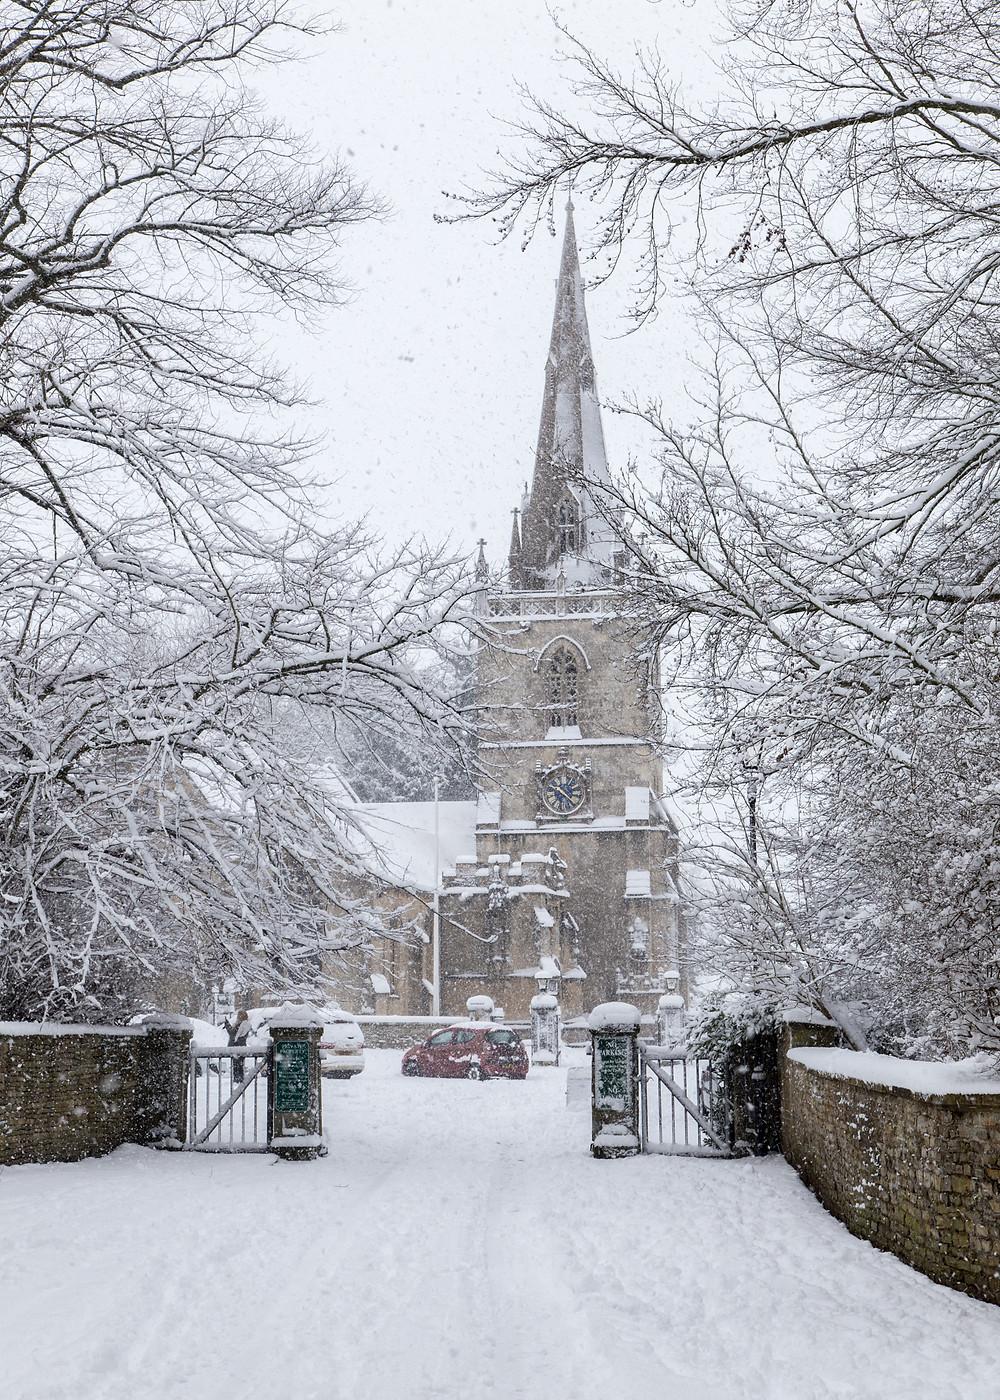 Winter comes to St Bartholomew's Church, Corsham